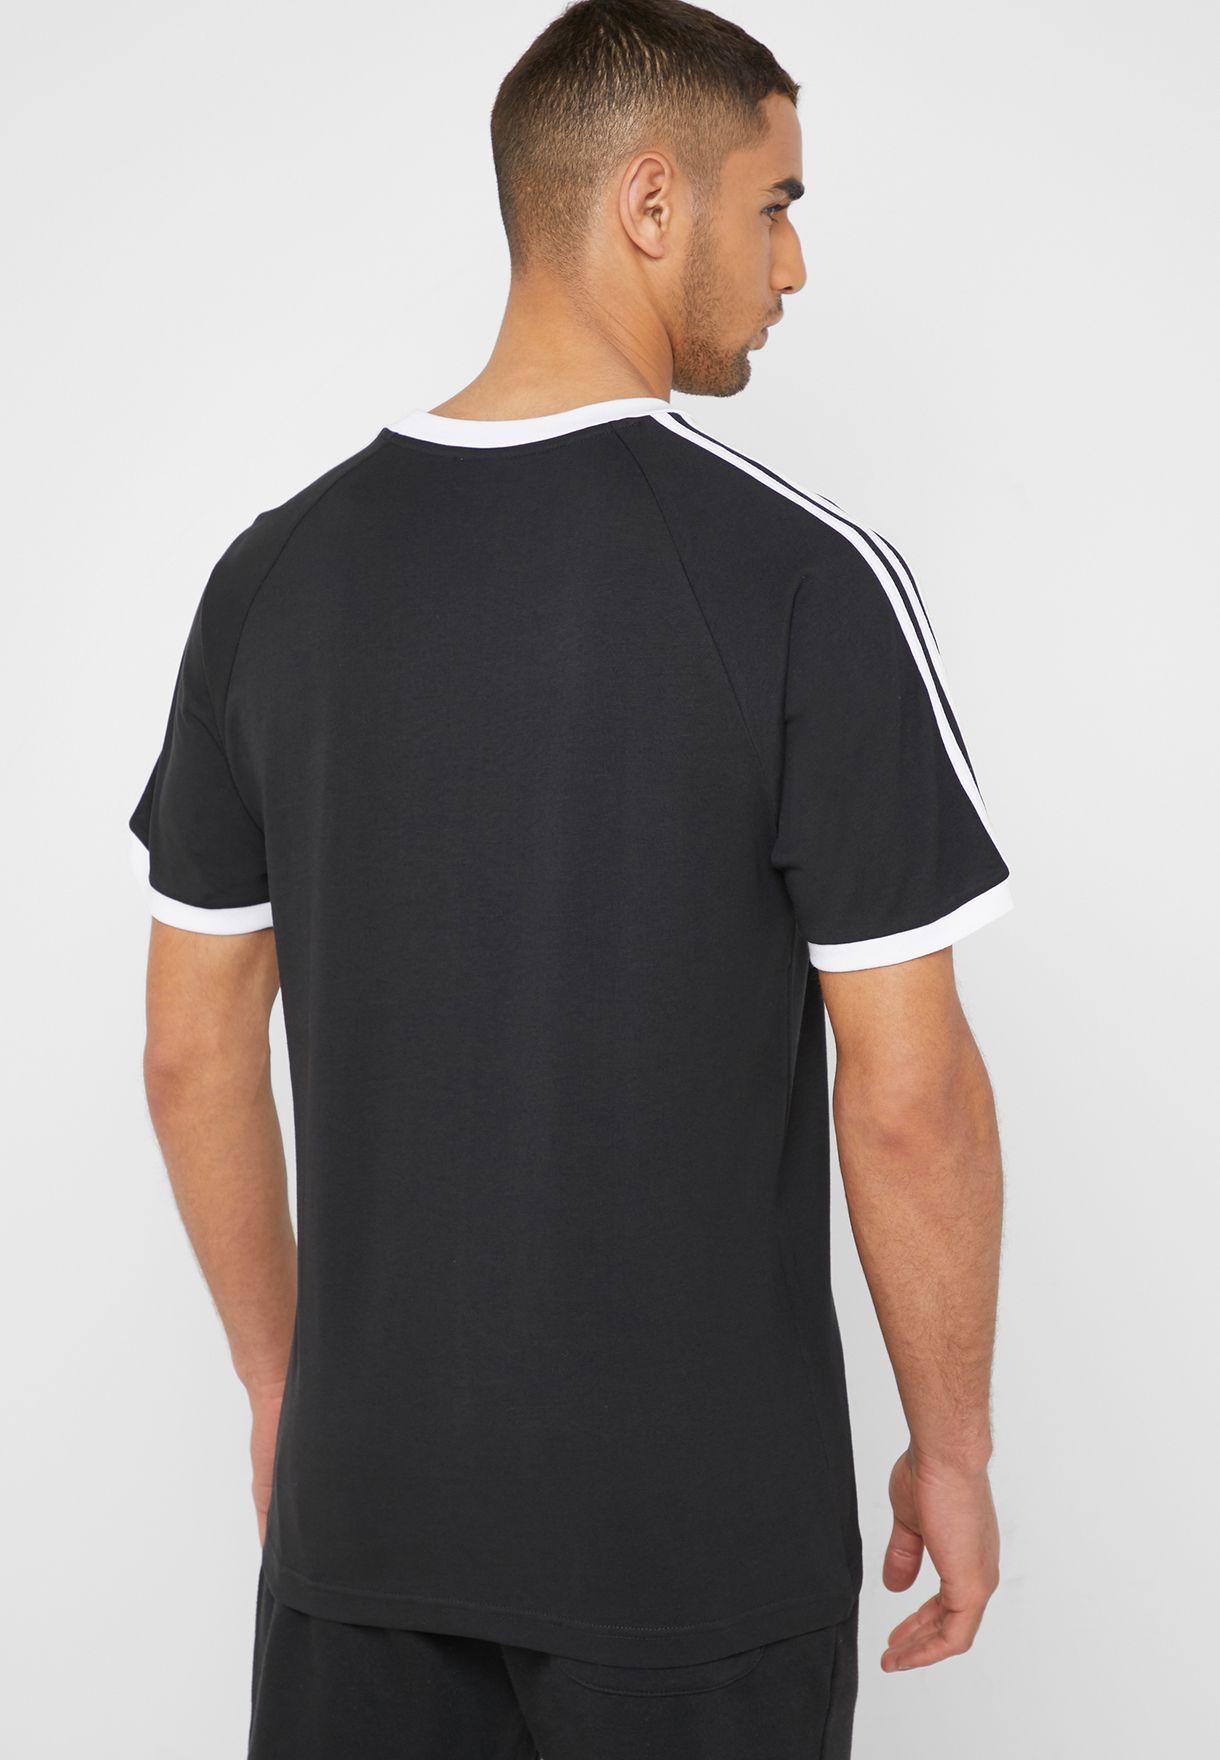 T shirt Tanaami California Noir adidas   adidas Switzerland